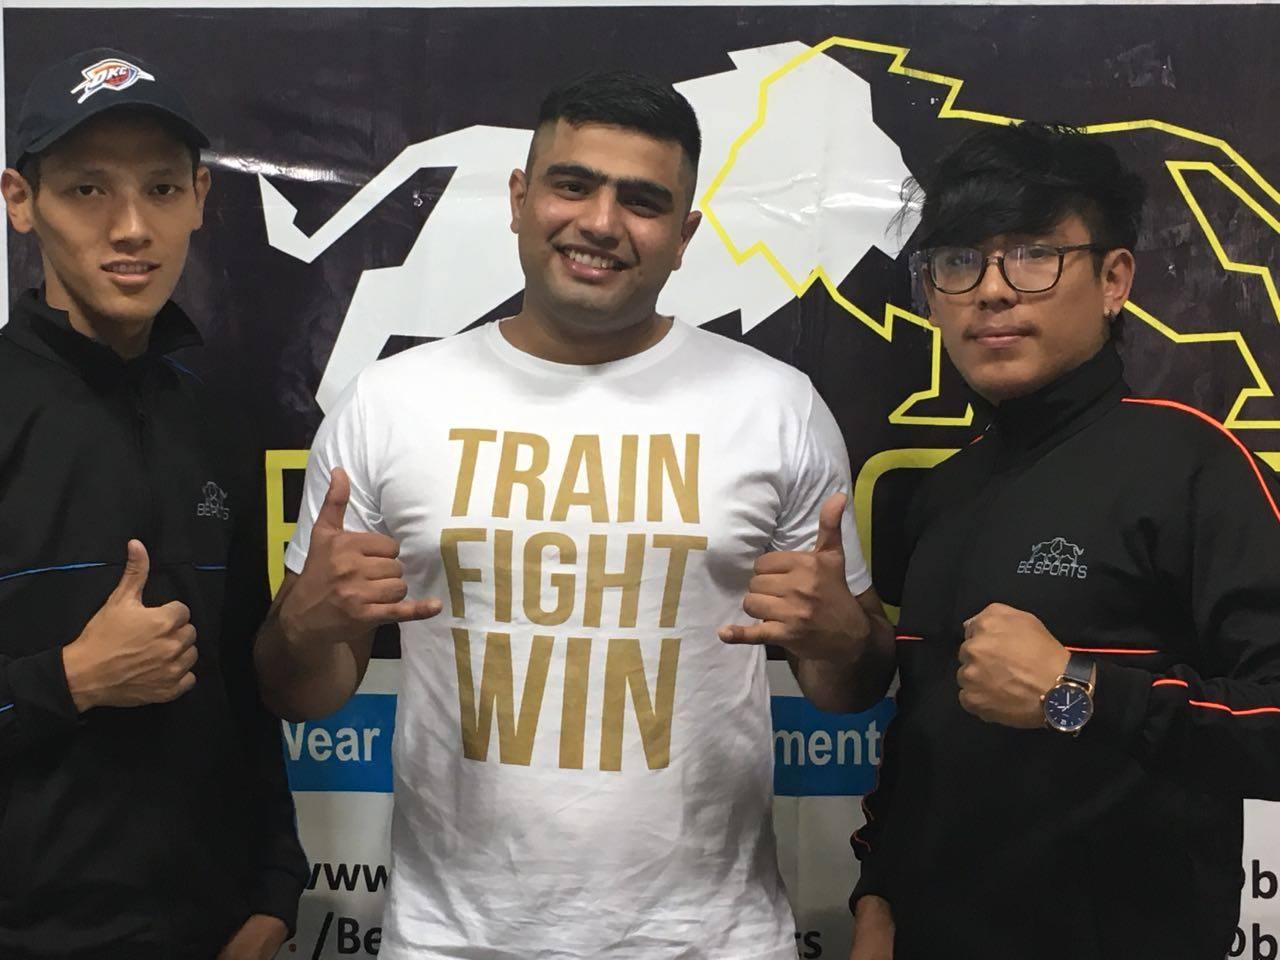 MMA fighter Mandeep Singh Dahiya backs Jason Solomon; wants out of SFL contract - Dahiya